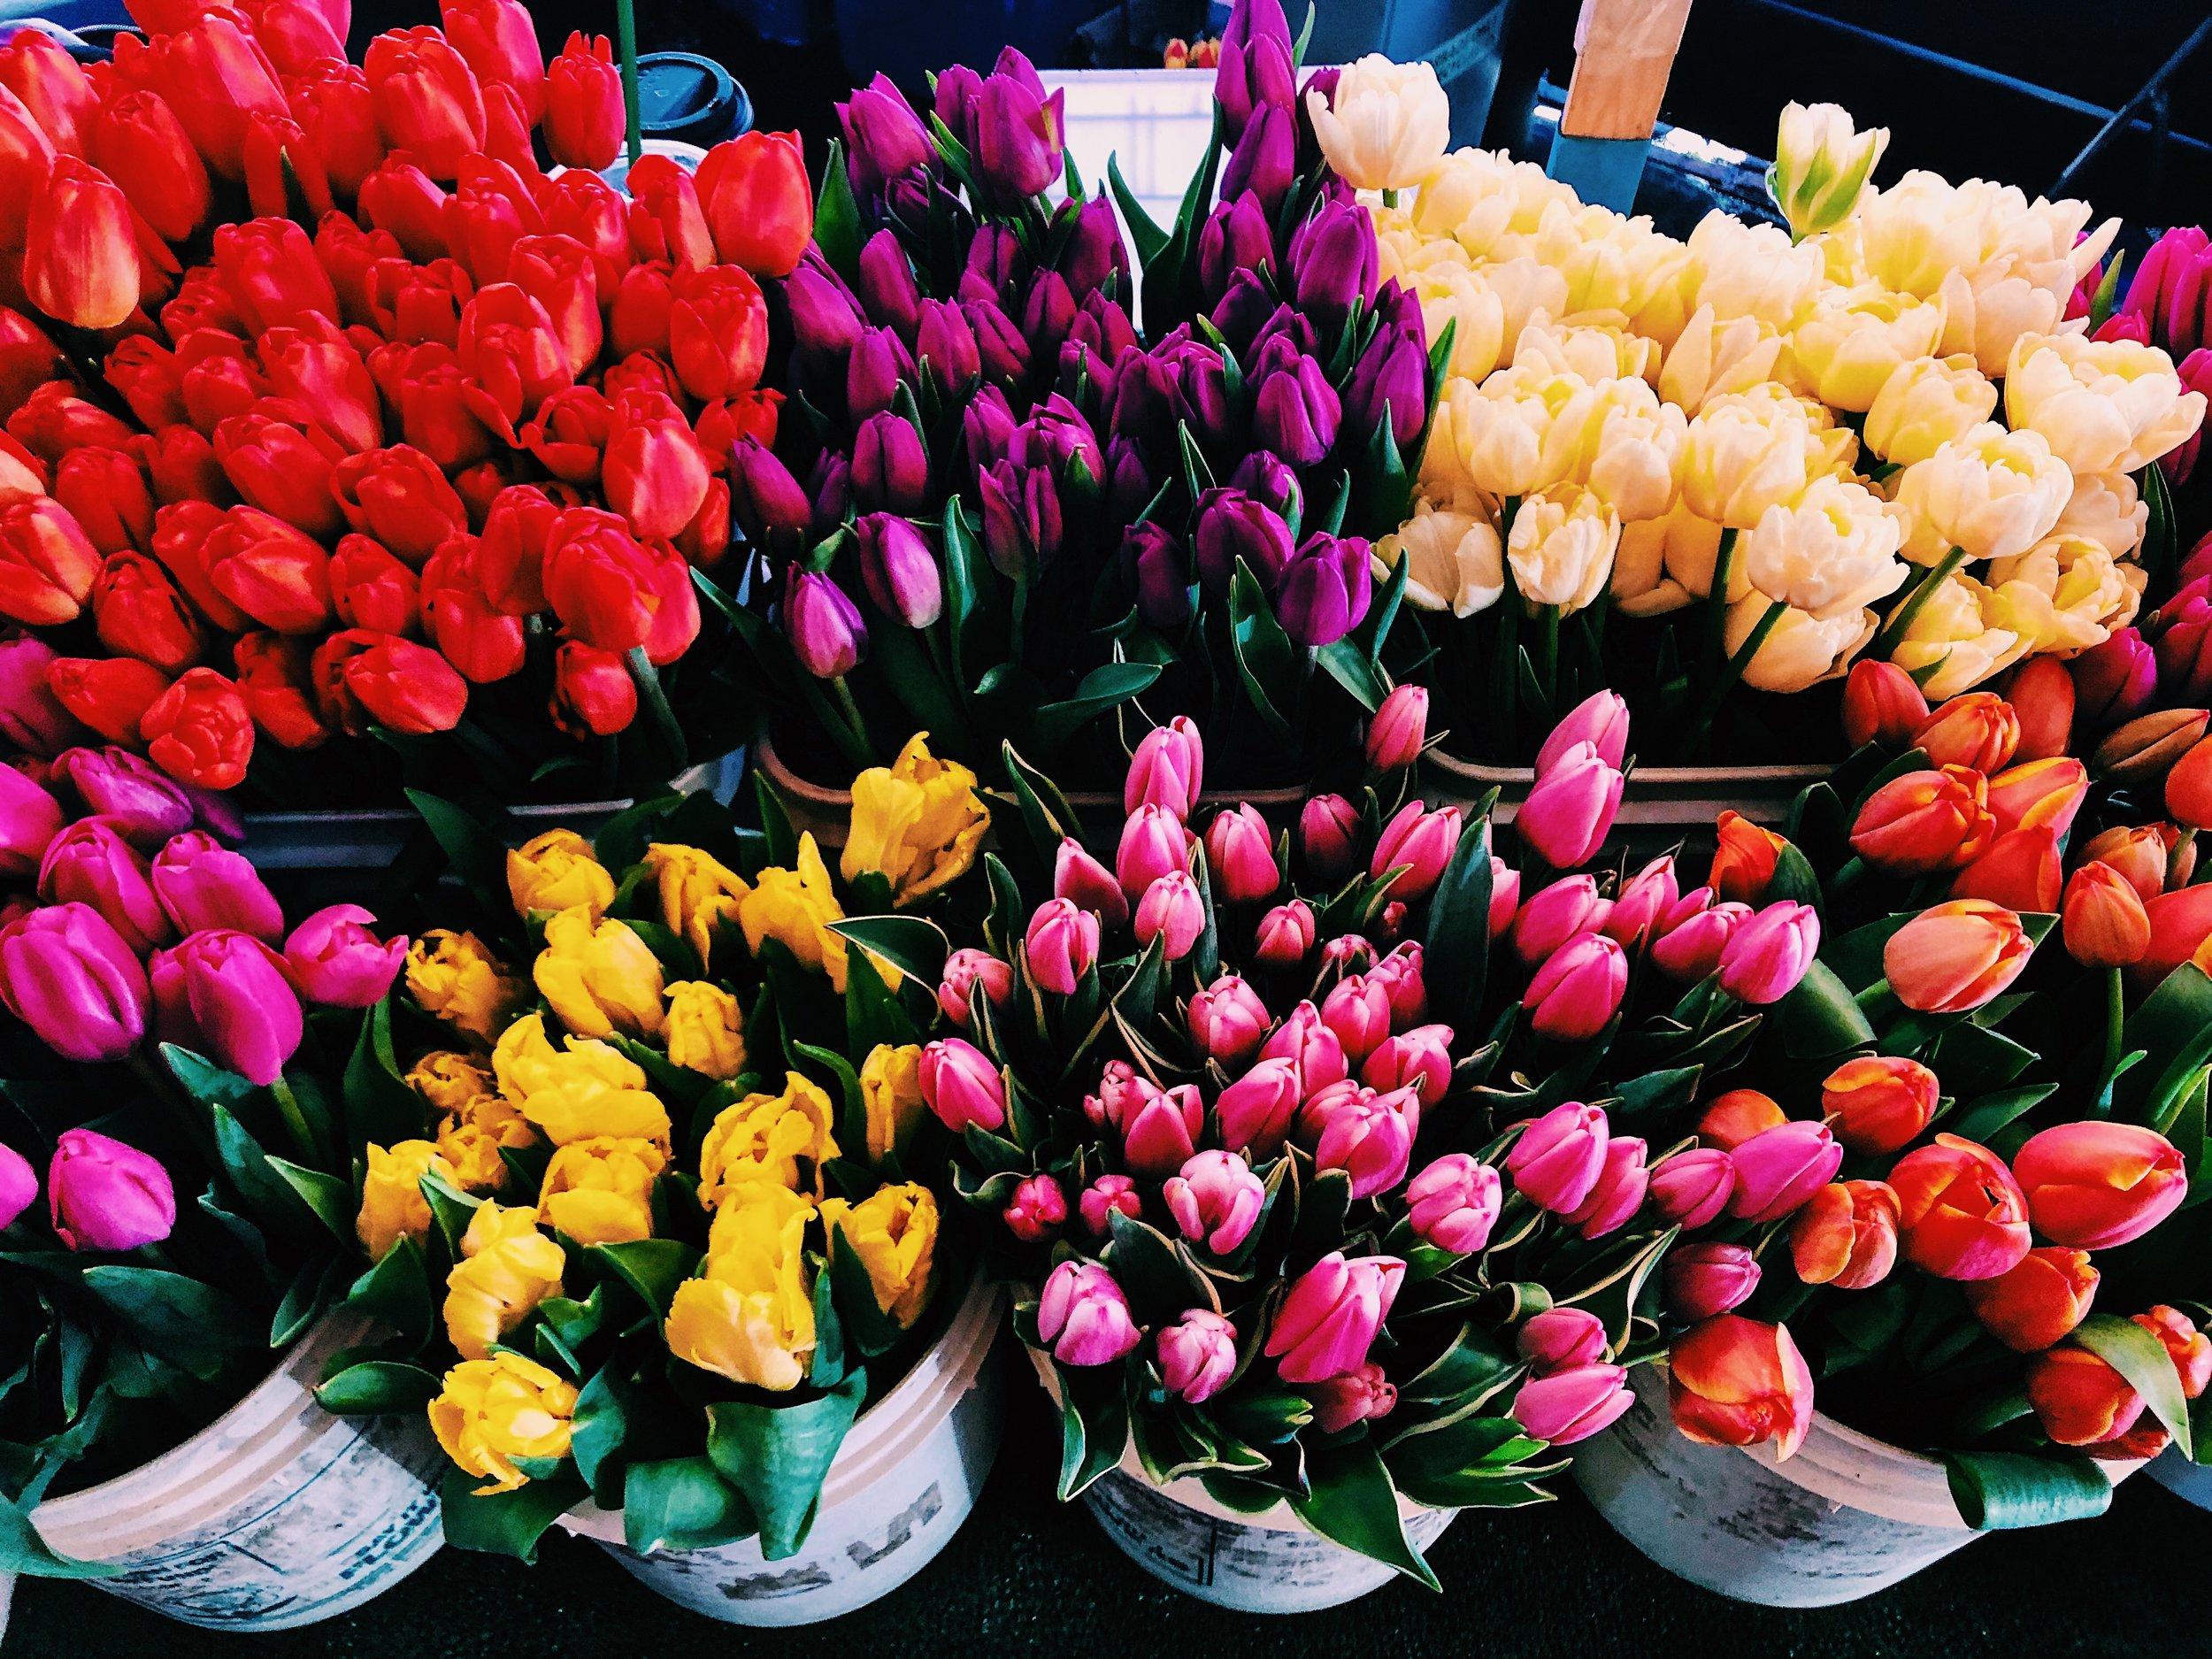 Pike Place tulips.jpg